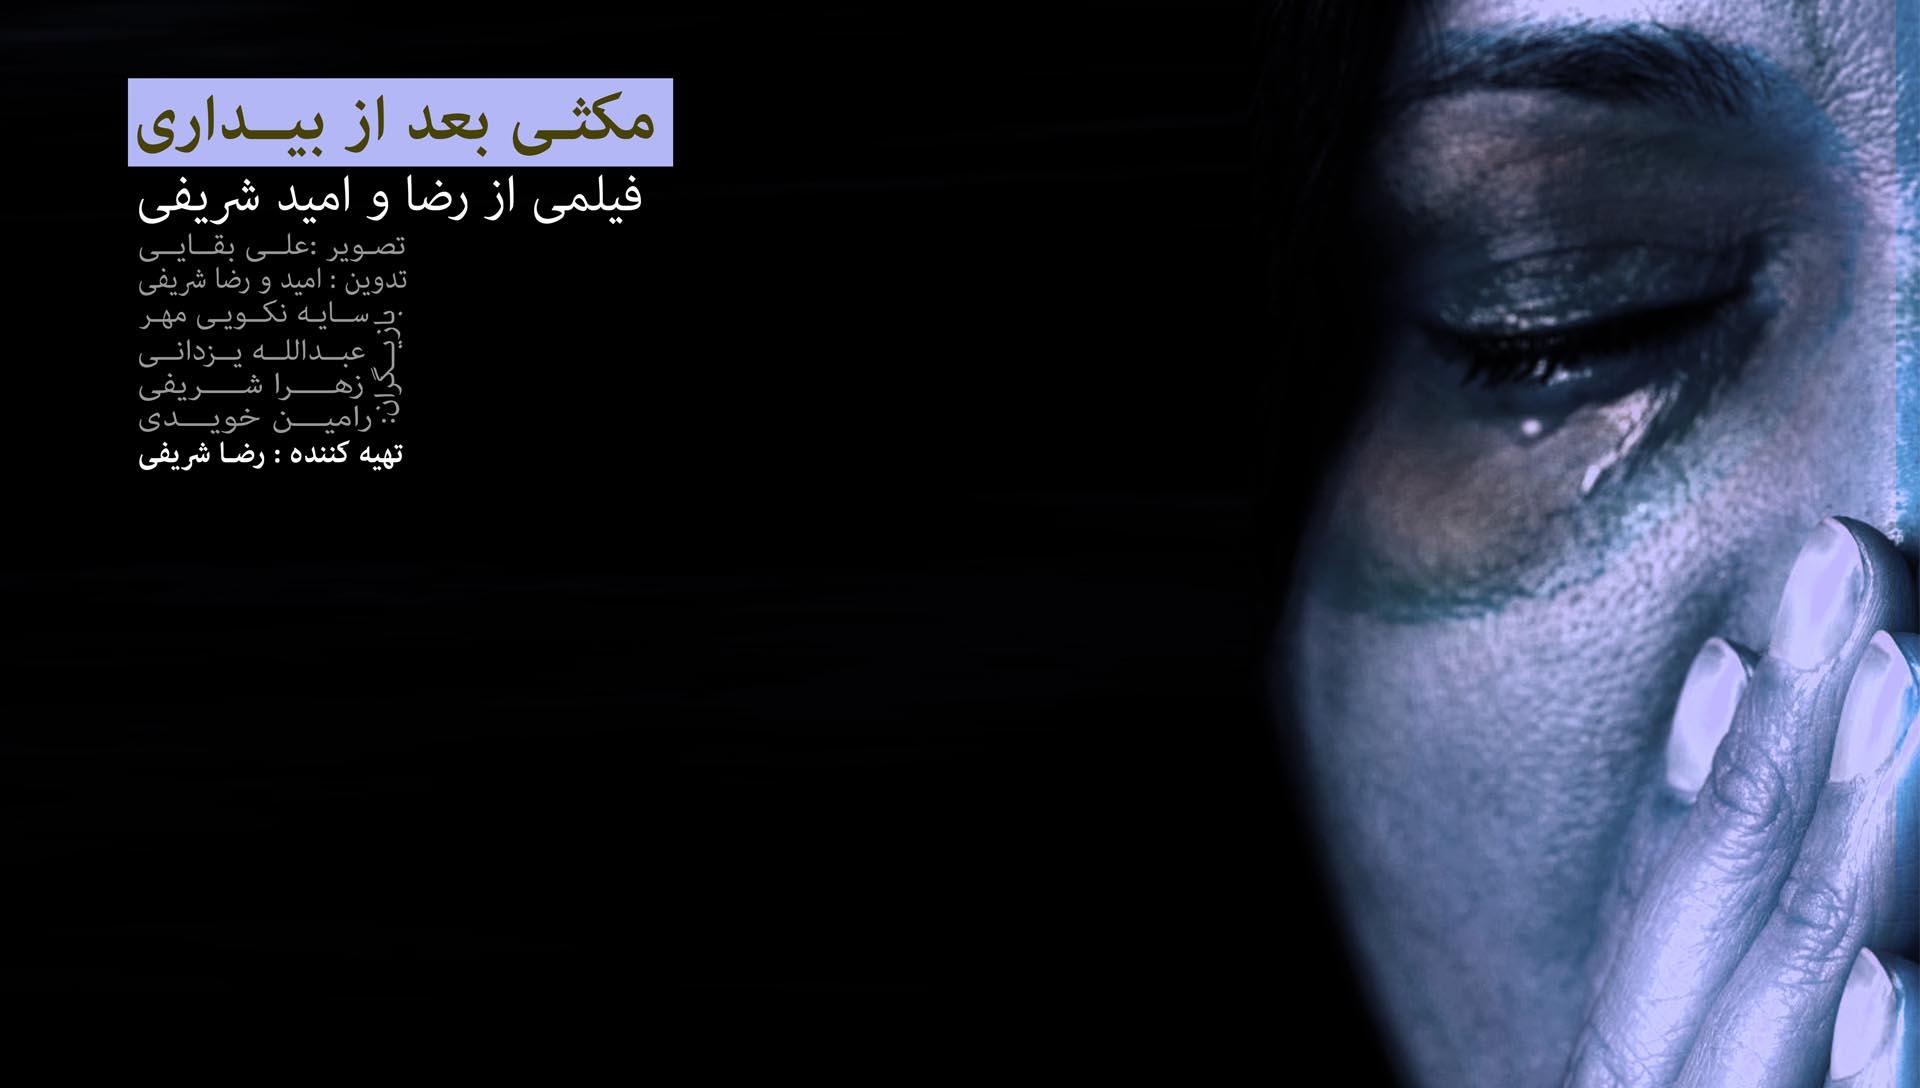 تدوین فیلم شیراز